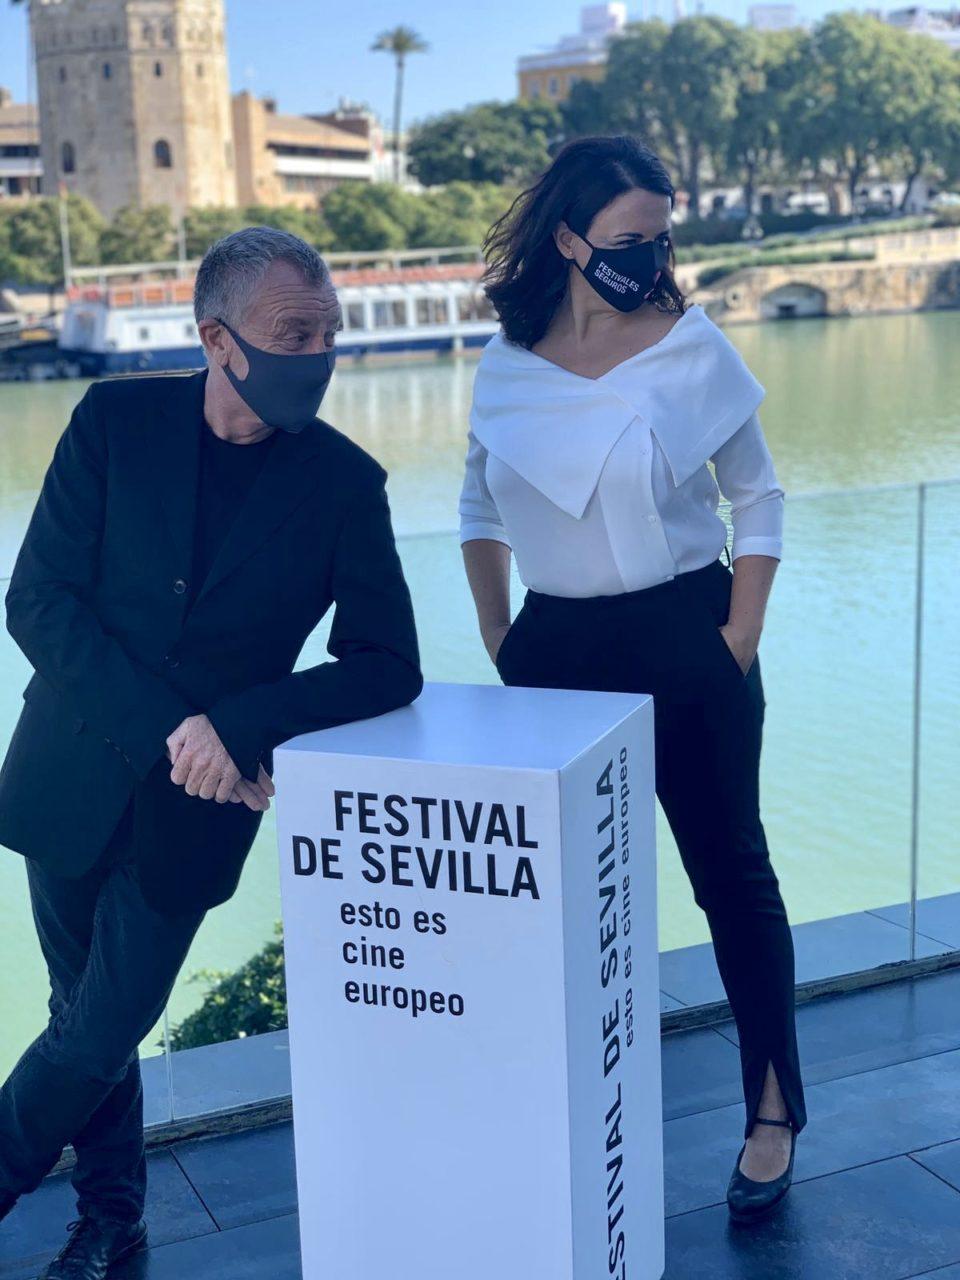 festival-cine-europeo-sevilla 8